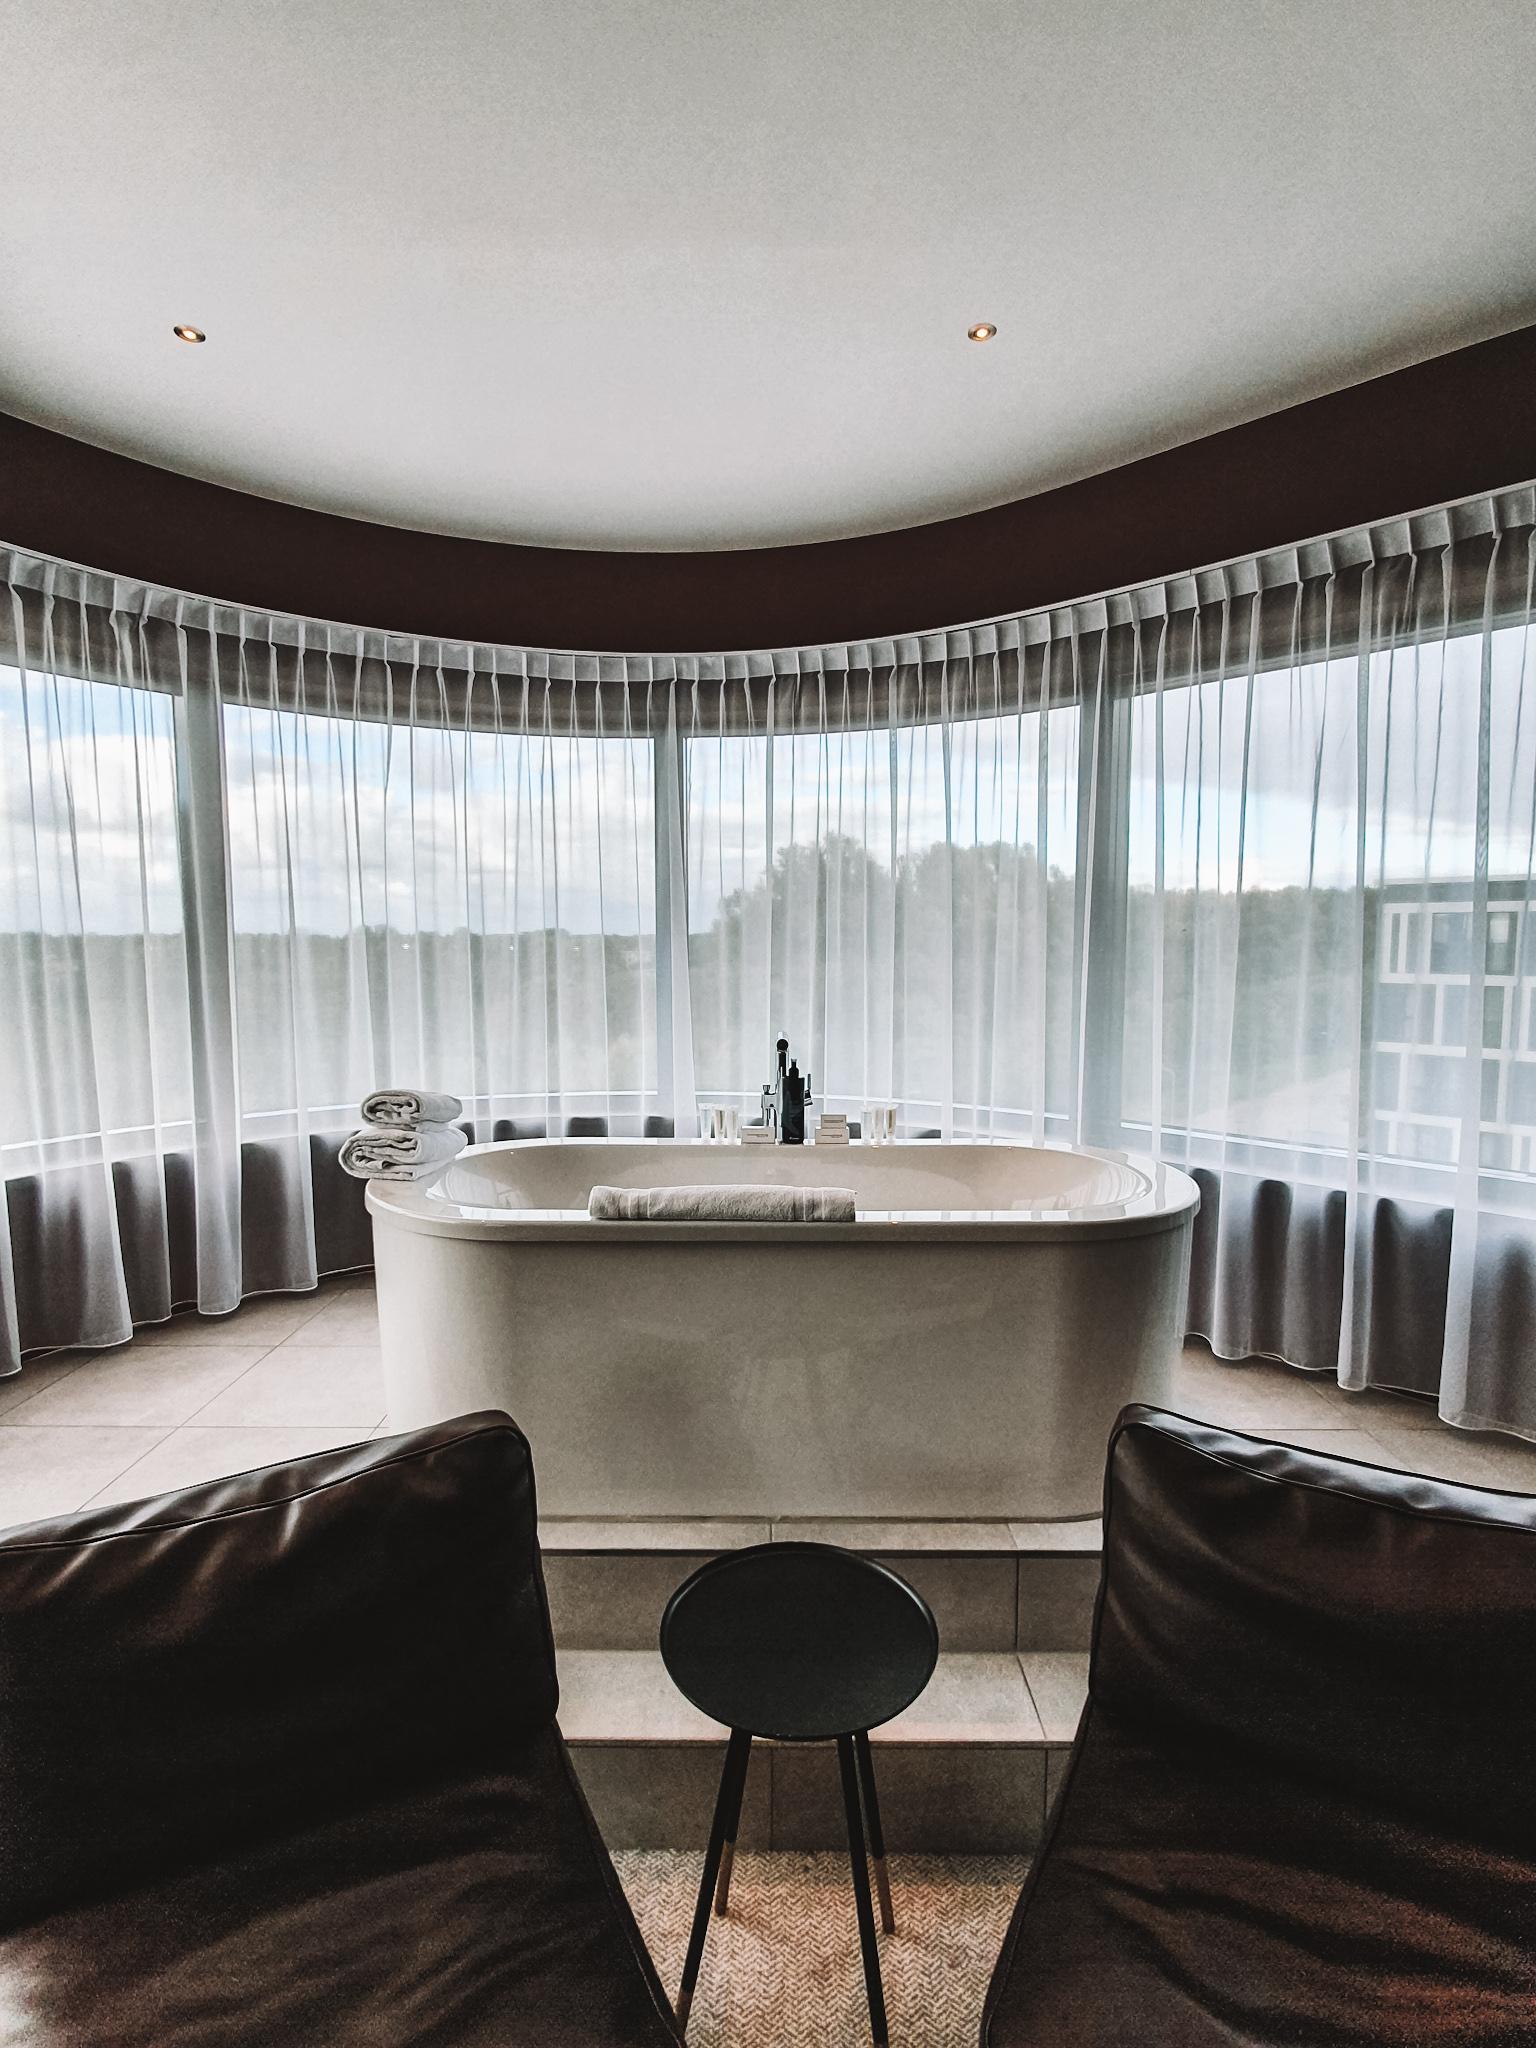 Bathtub Corendon Village Hotel